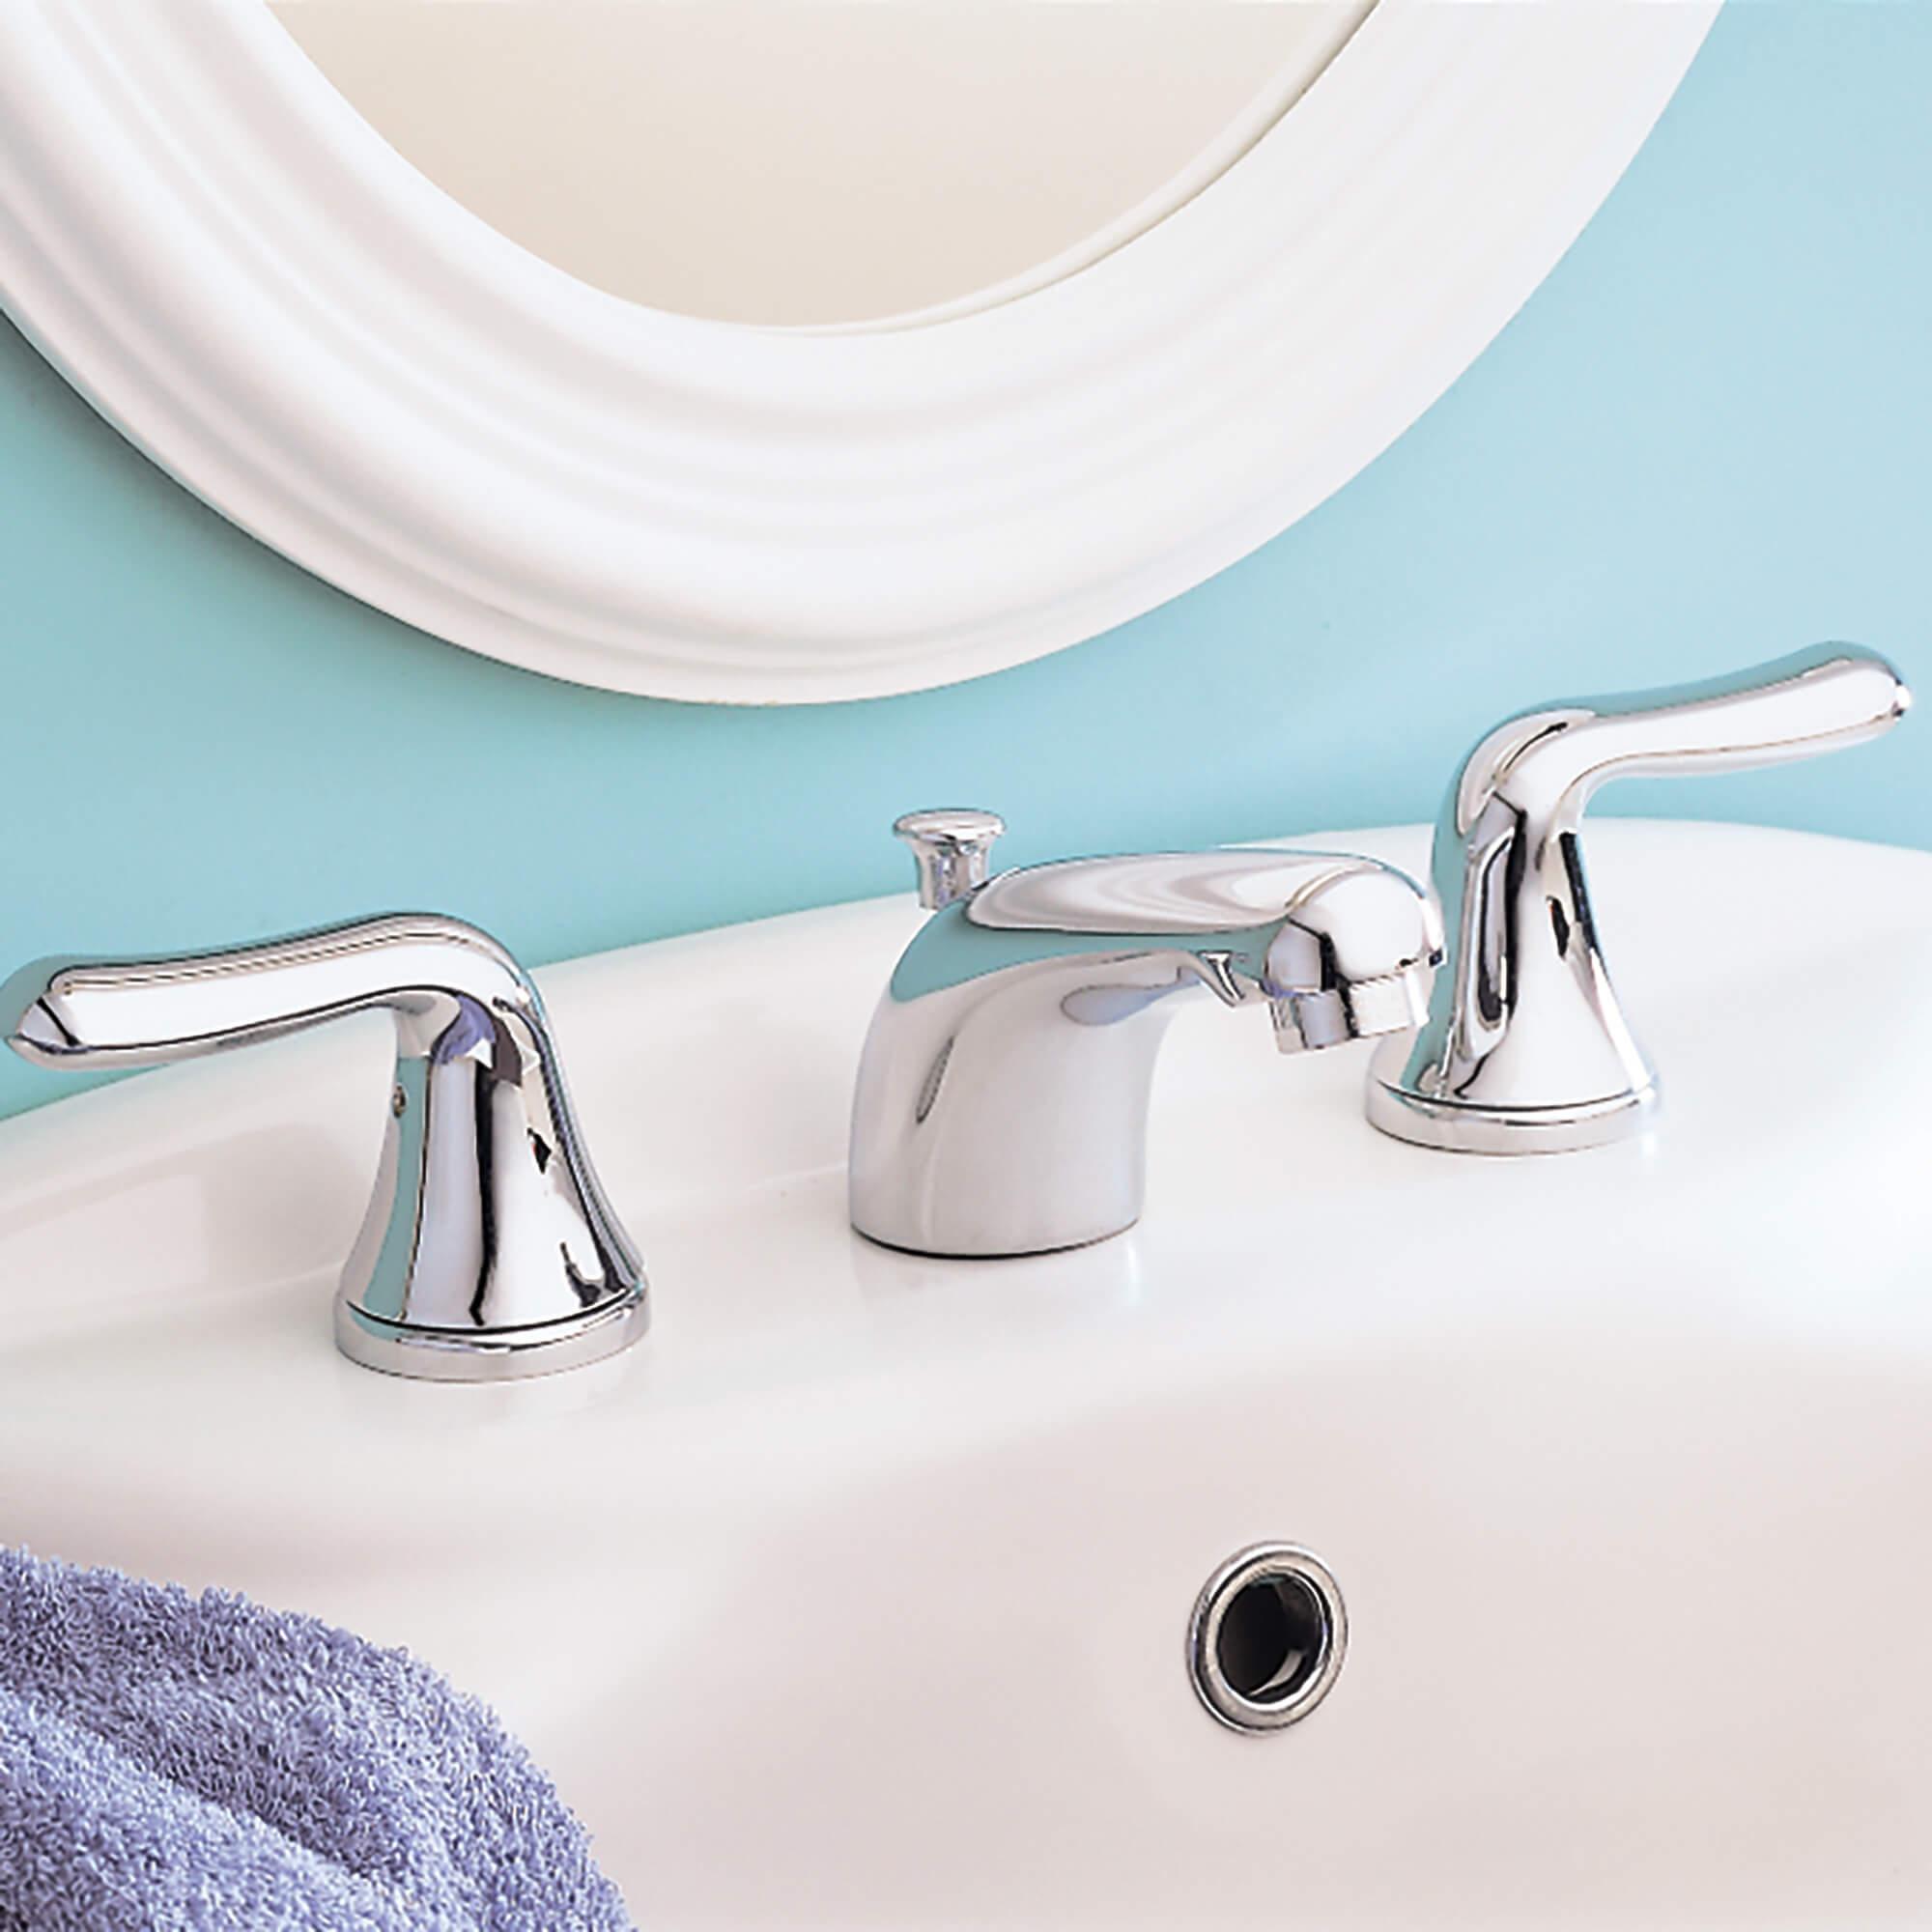 Colony Soft bathroom faucet